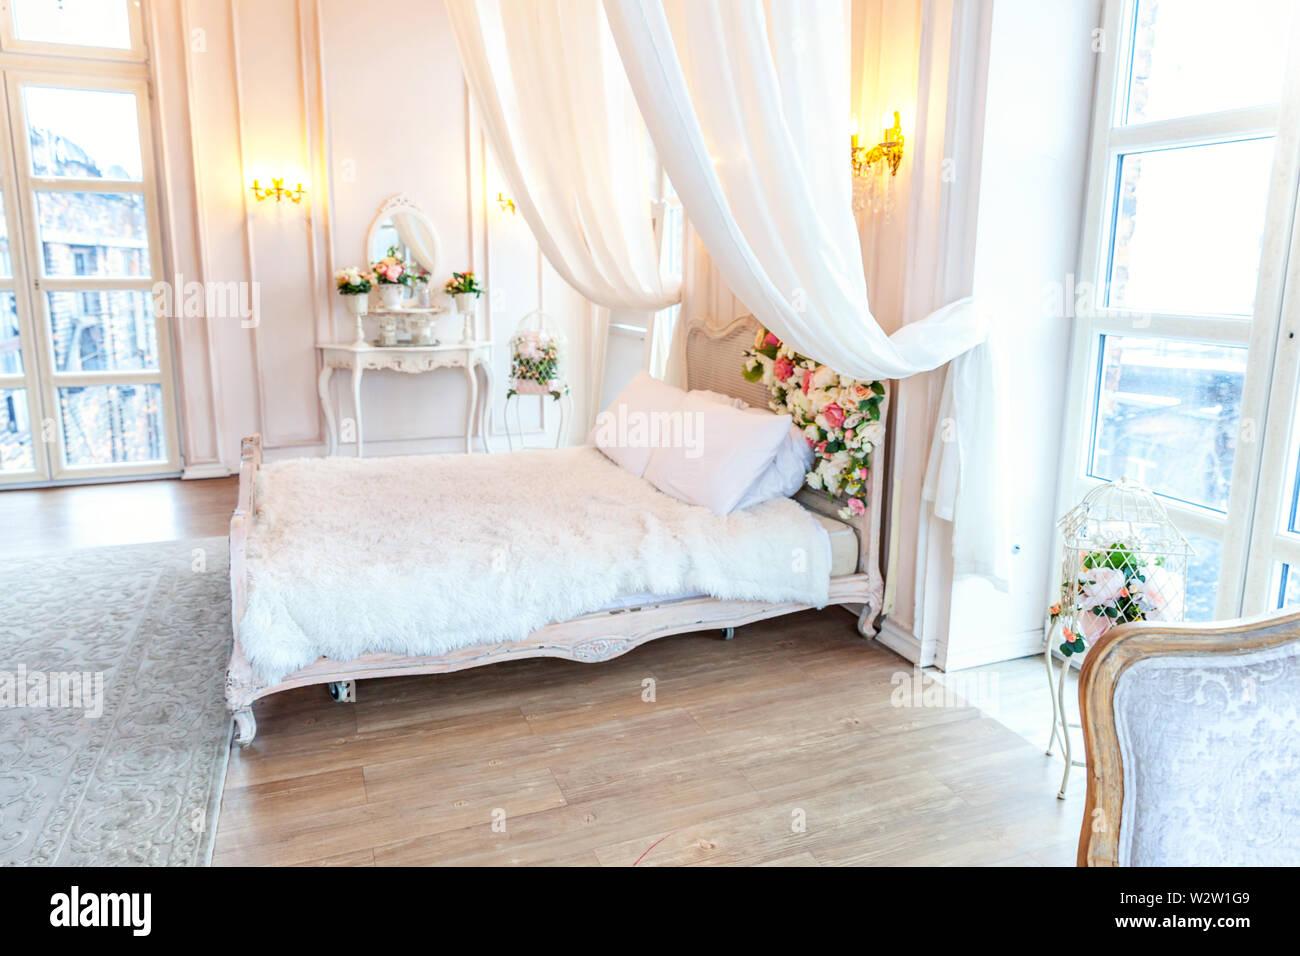 Pleasant Beautiful Luxury Classic White Bright Clean Interior Bedroom Home Interior And Landscaping Eliaenasavecom